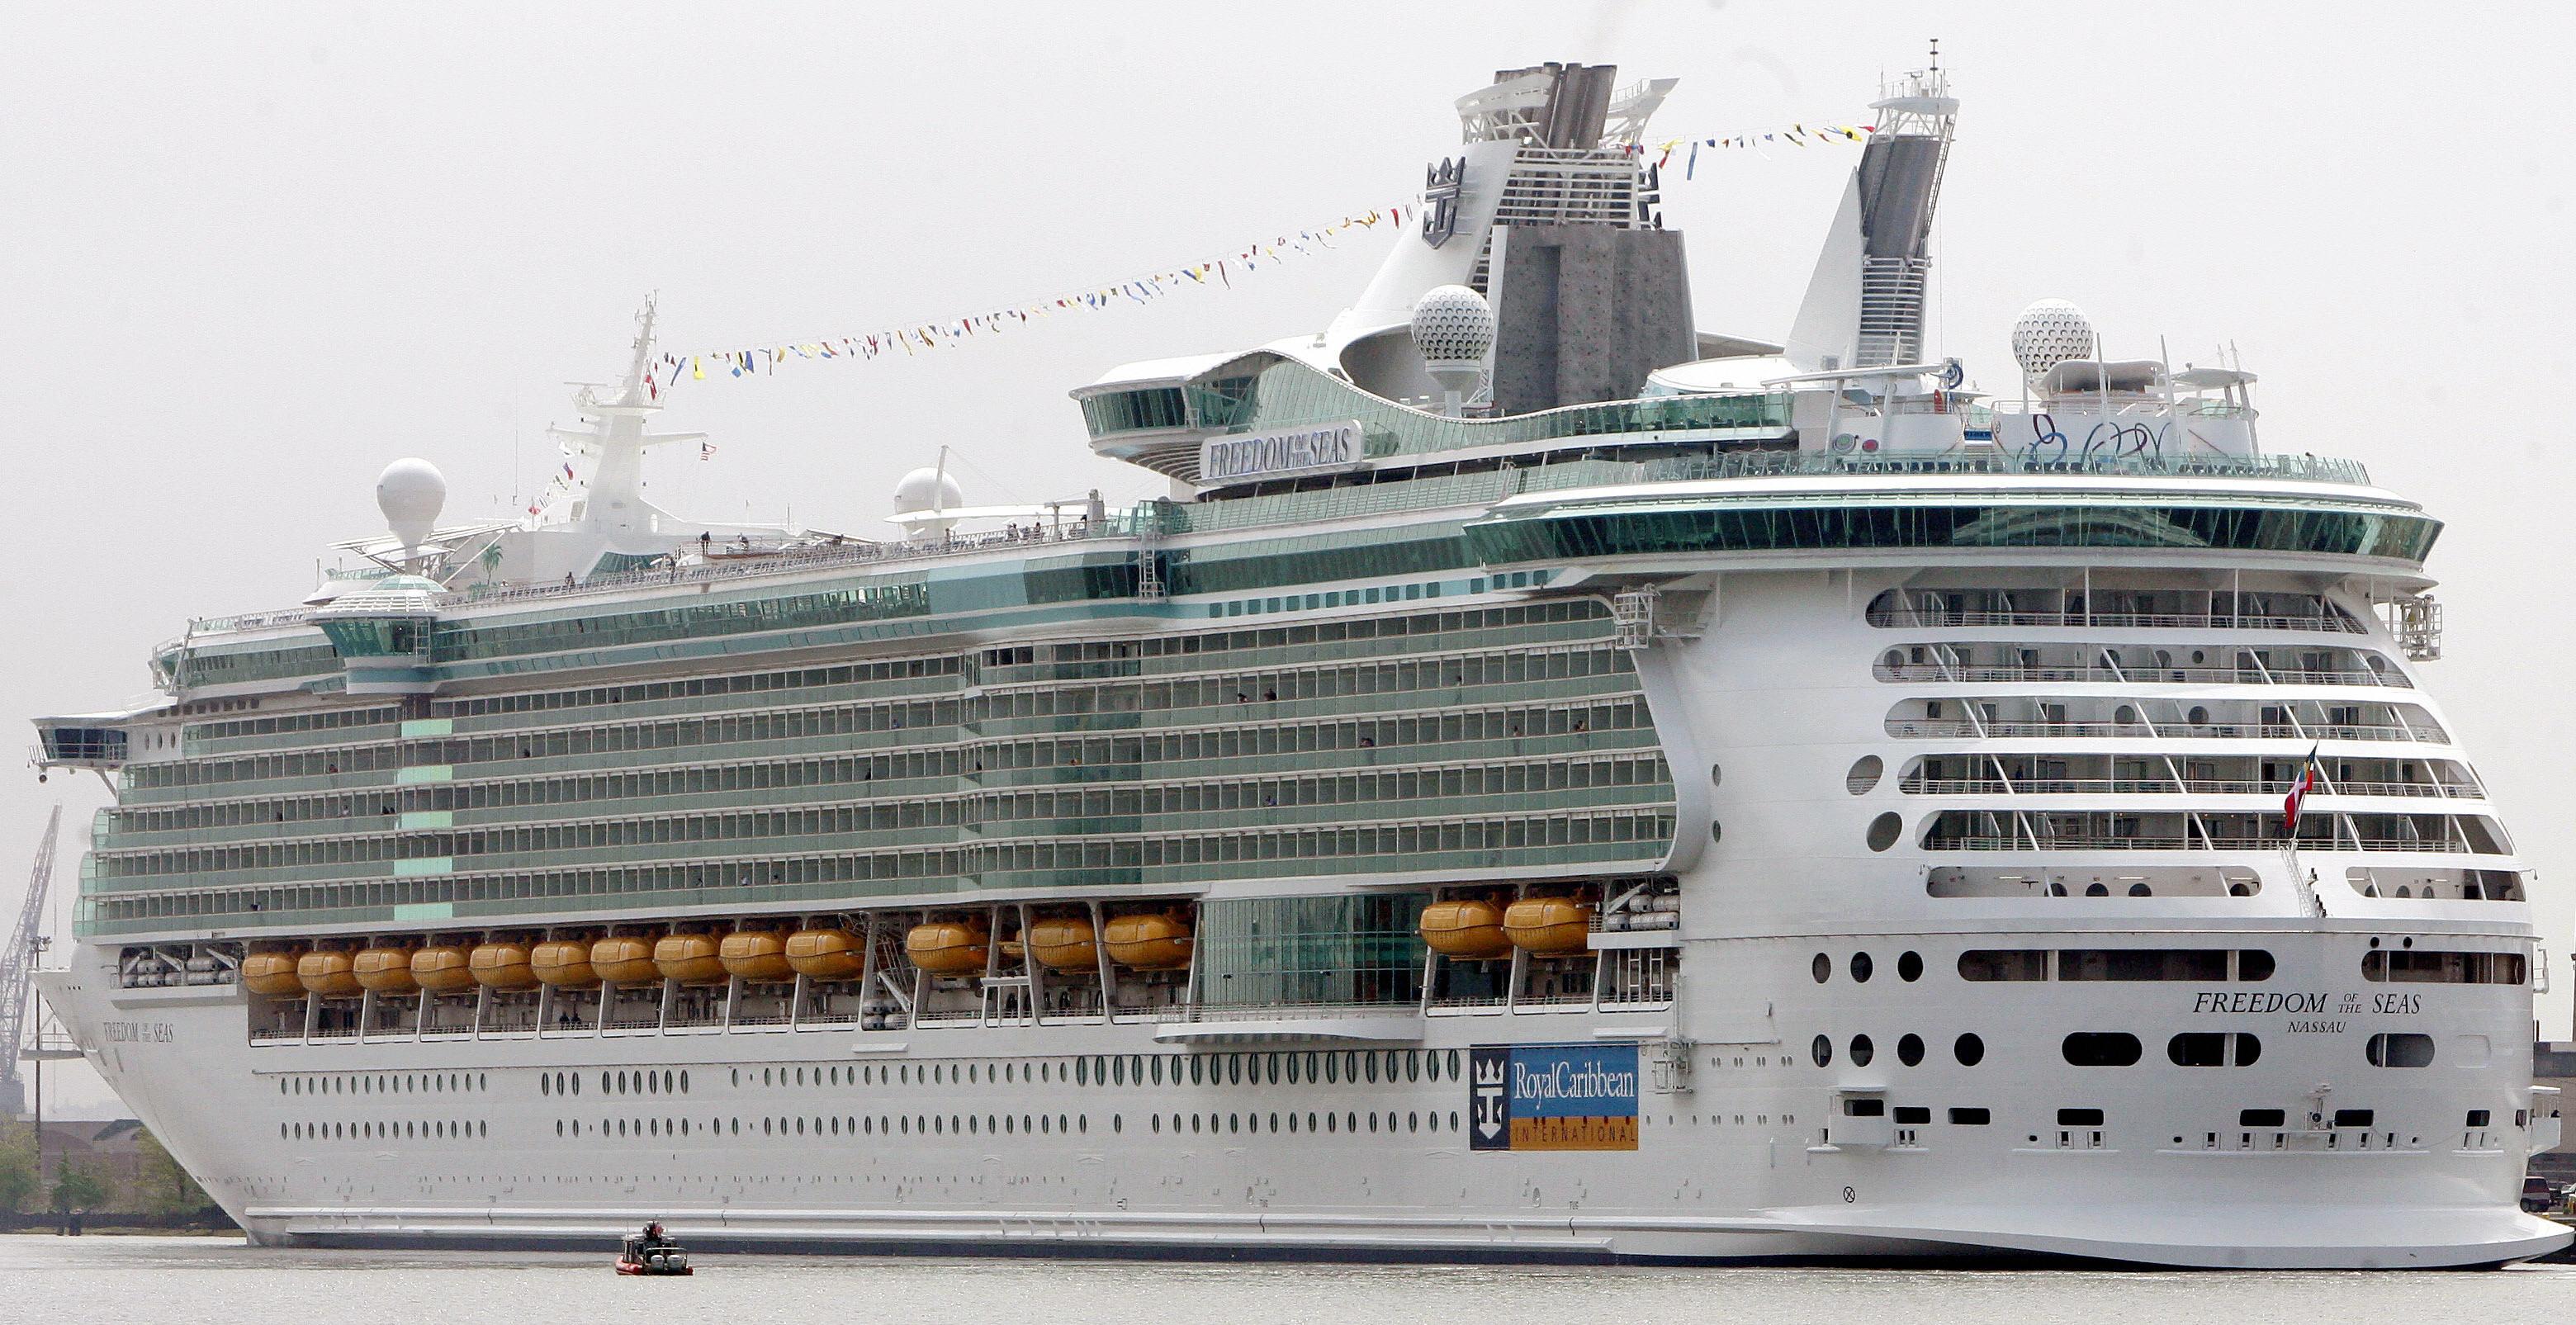 Freedom of the Seas, Royal Caribbean 2006